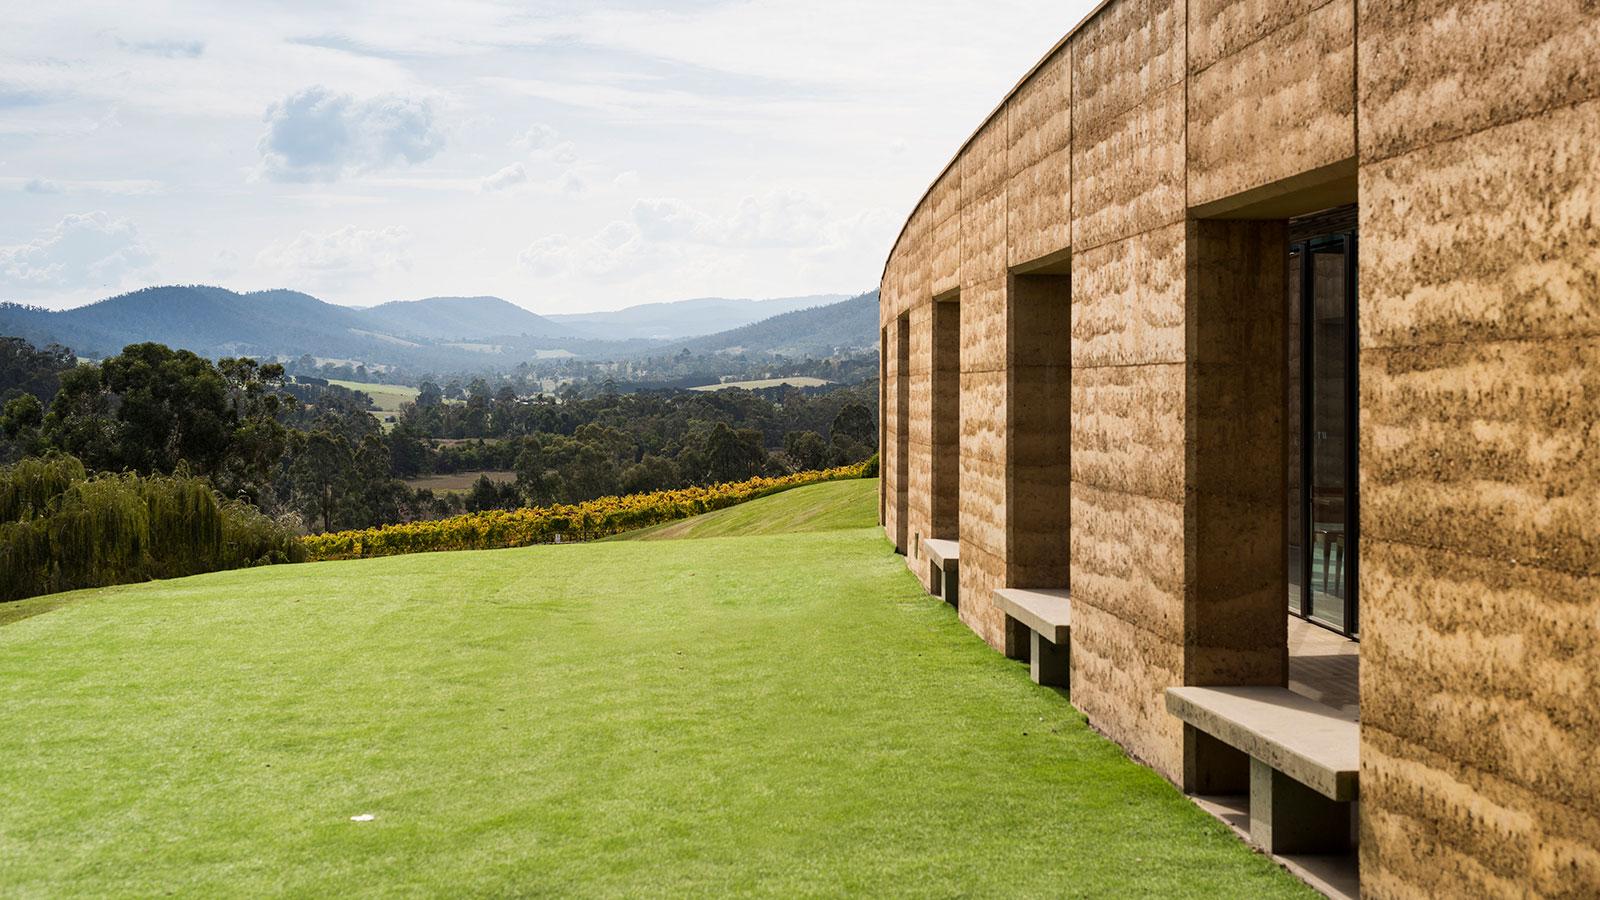 TarraWarra Estate, Yarra Valley and Dandenong Ranges, Victoria, Australia